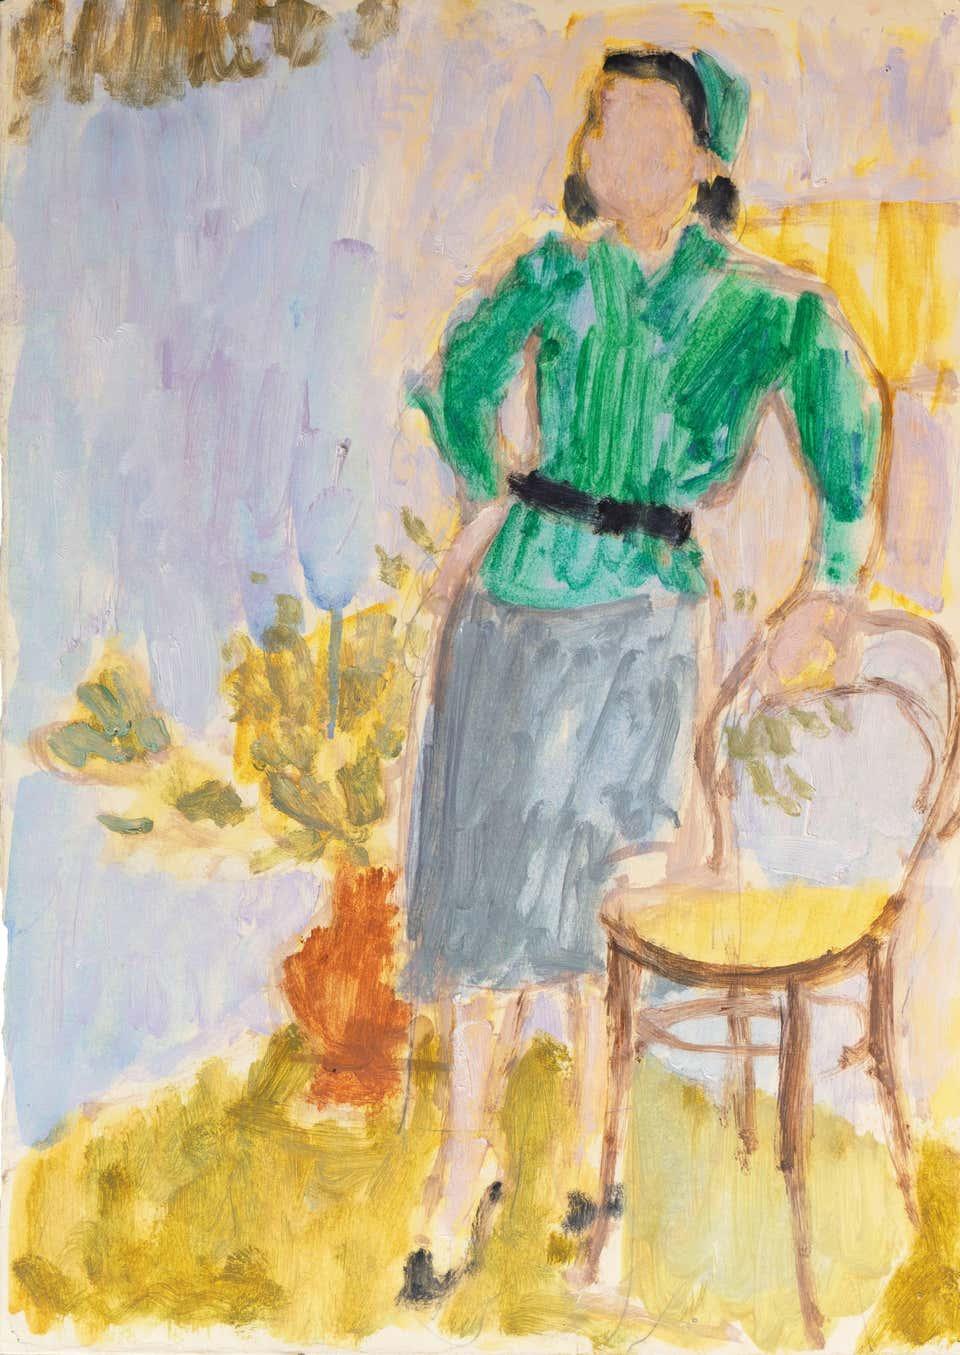 Victor Di Gesu Art - 77 For Sale at 1stdibs